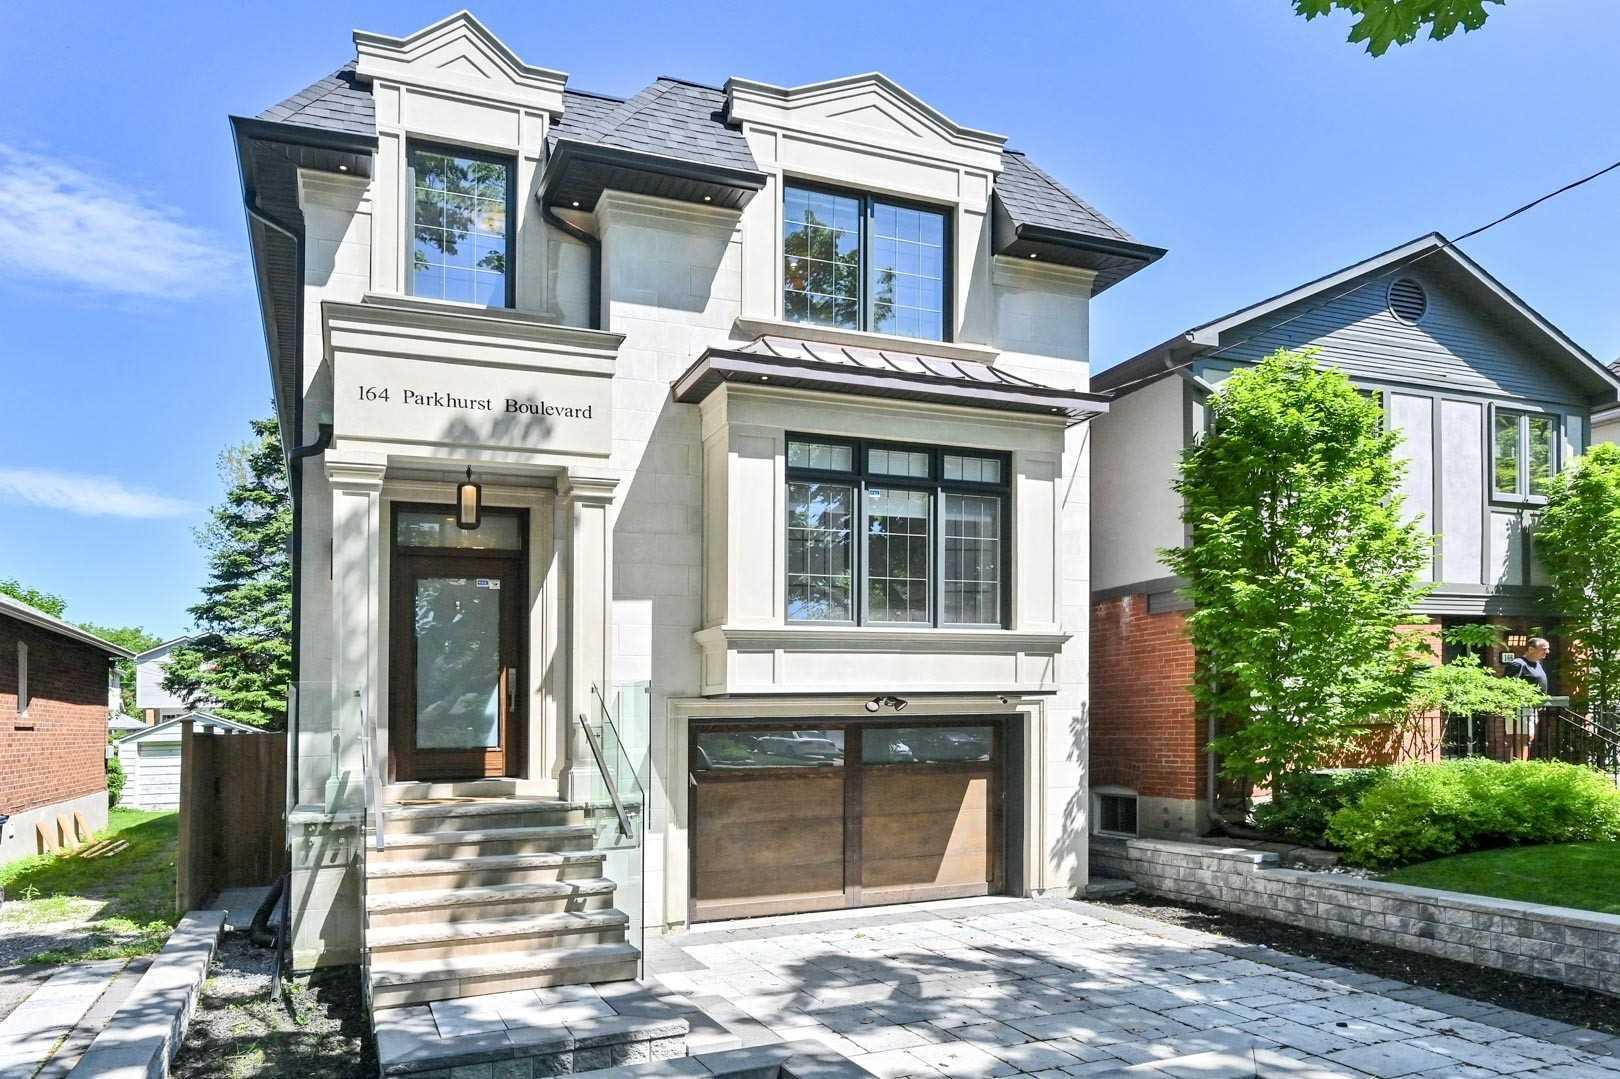 164 Parkhurst Blvd, Toronto, M4G2G1